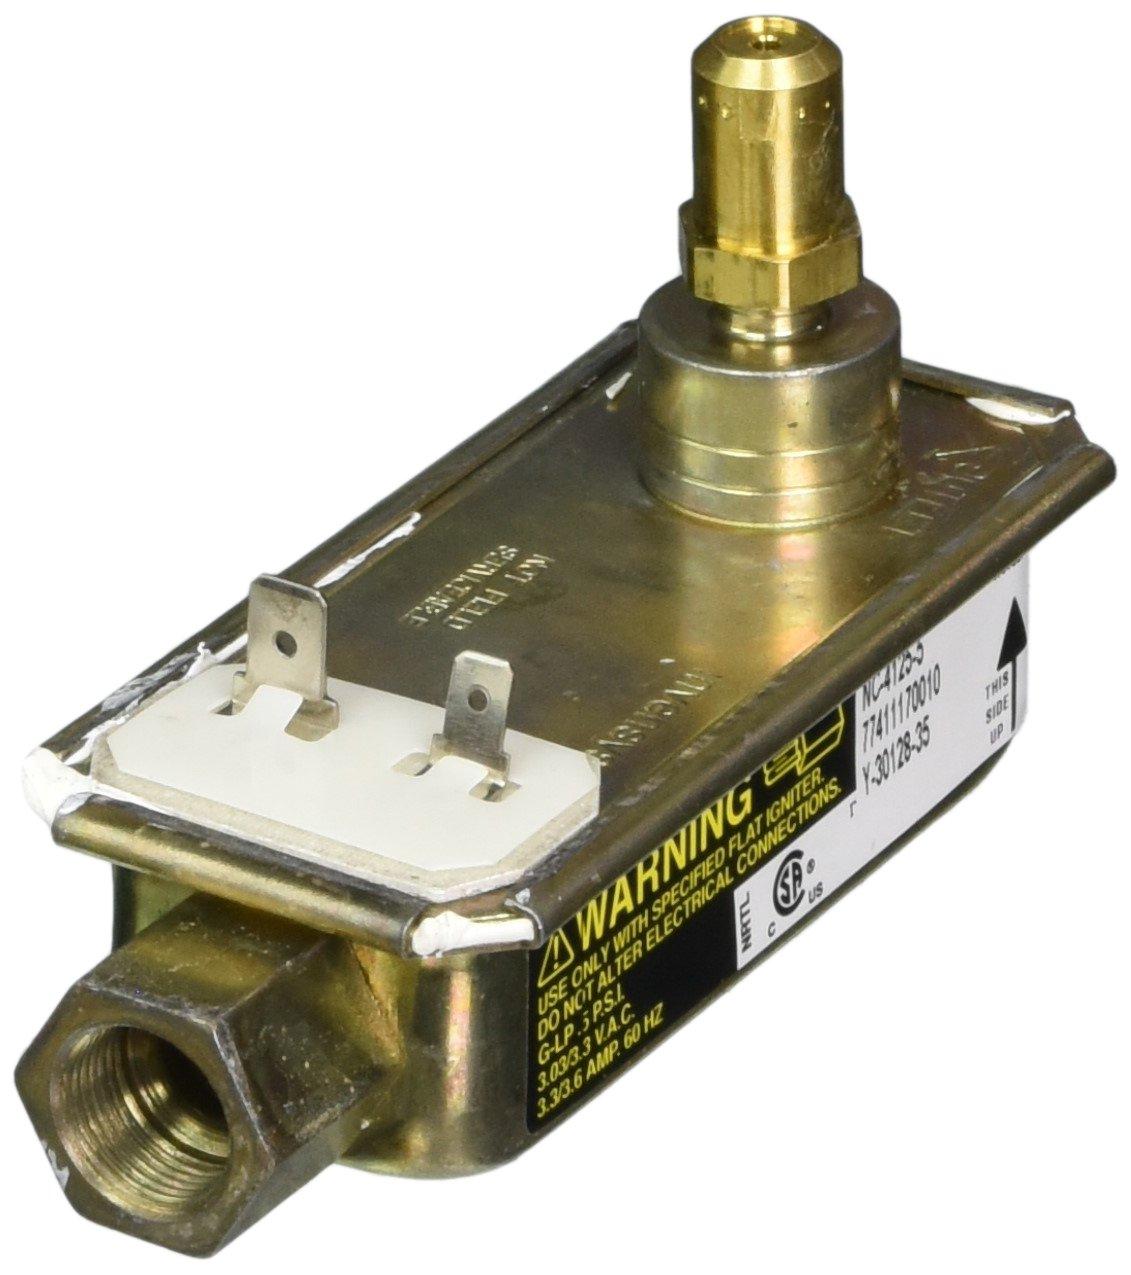 Recertified Frigidaire 3203459 Range Oven Safety Valve NC-4125-5 Y-30128-35